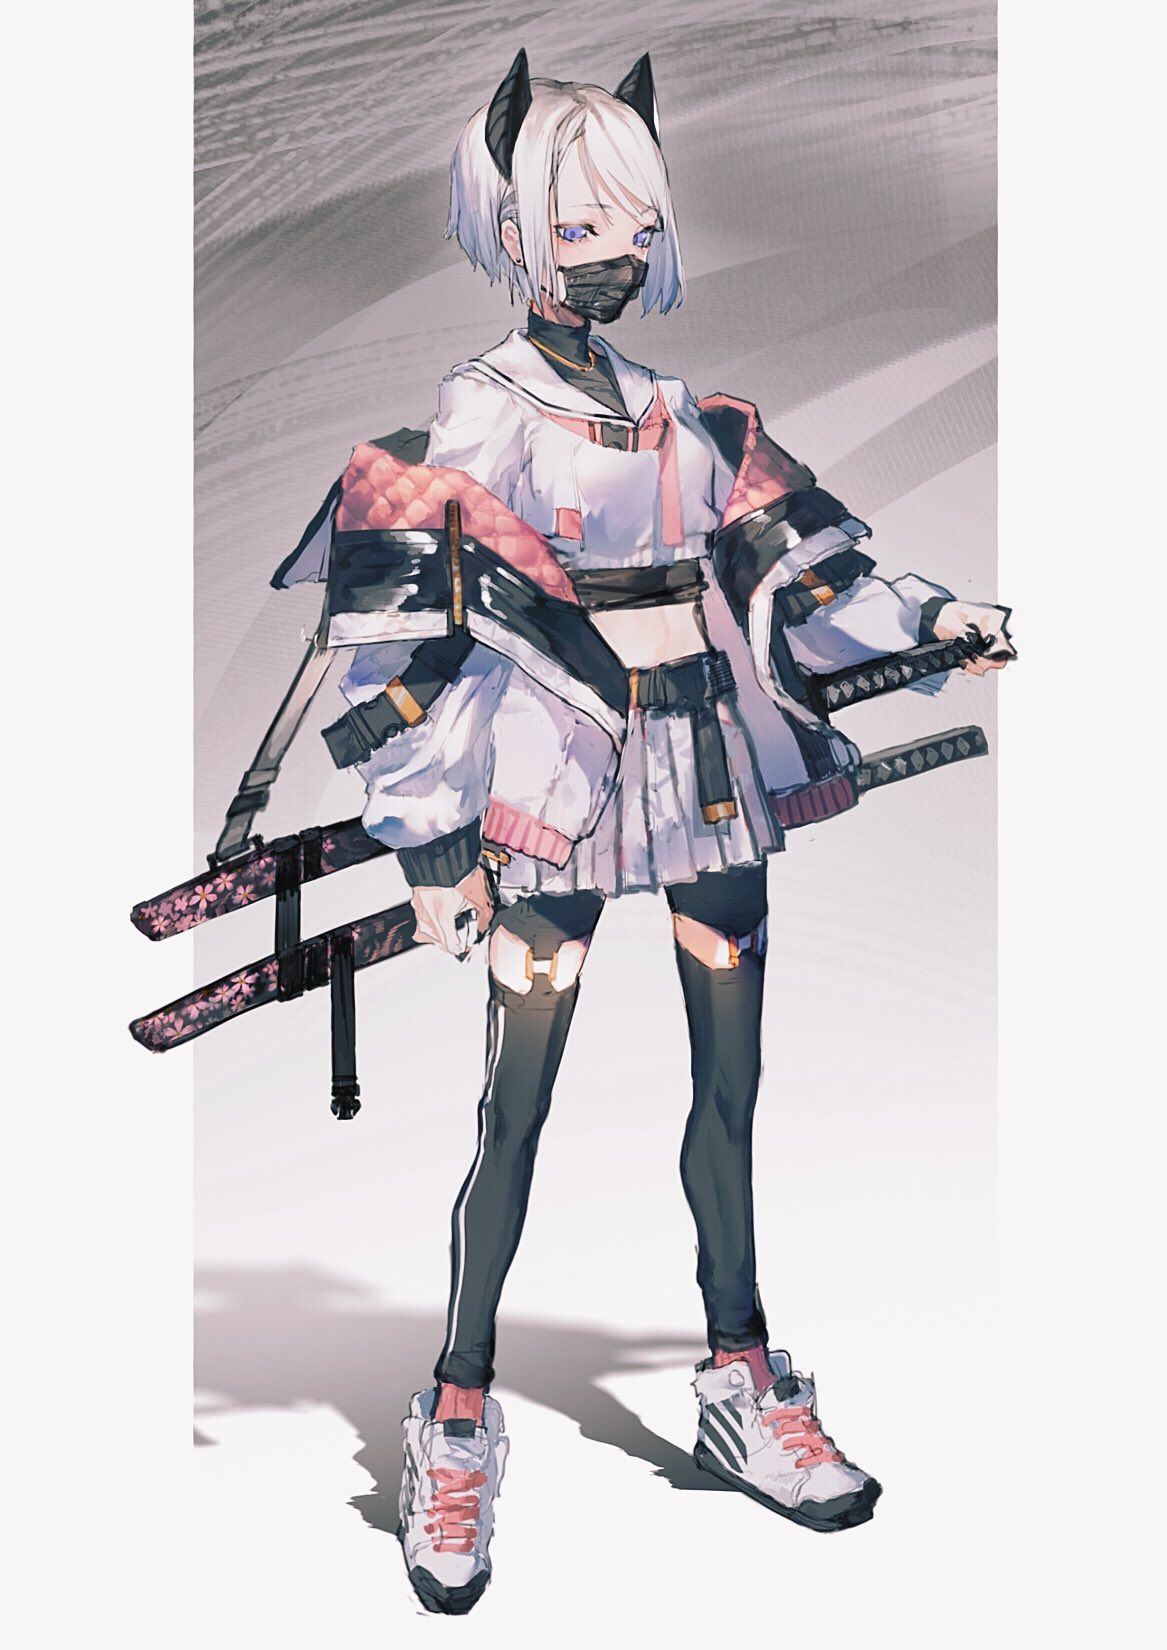 Nonokuro On Twitter Anime Character Design Character Design Concept Art Characters